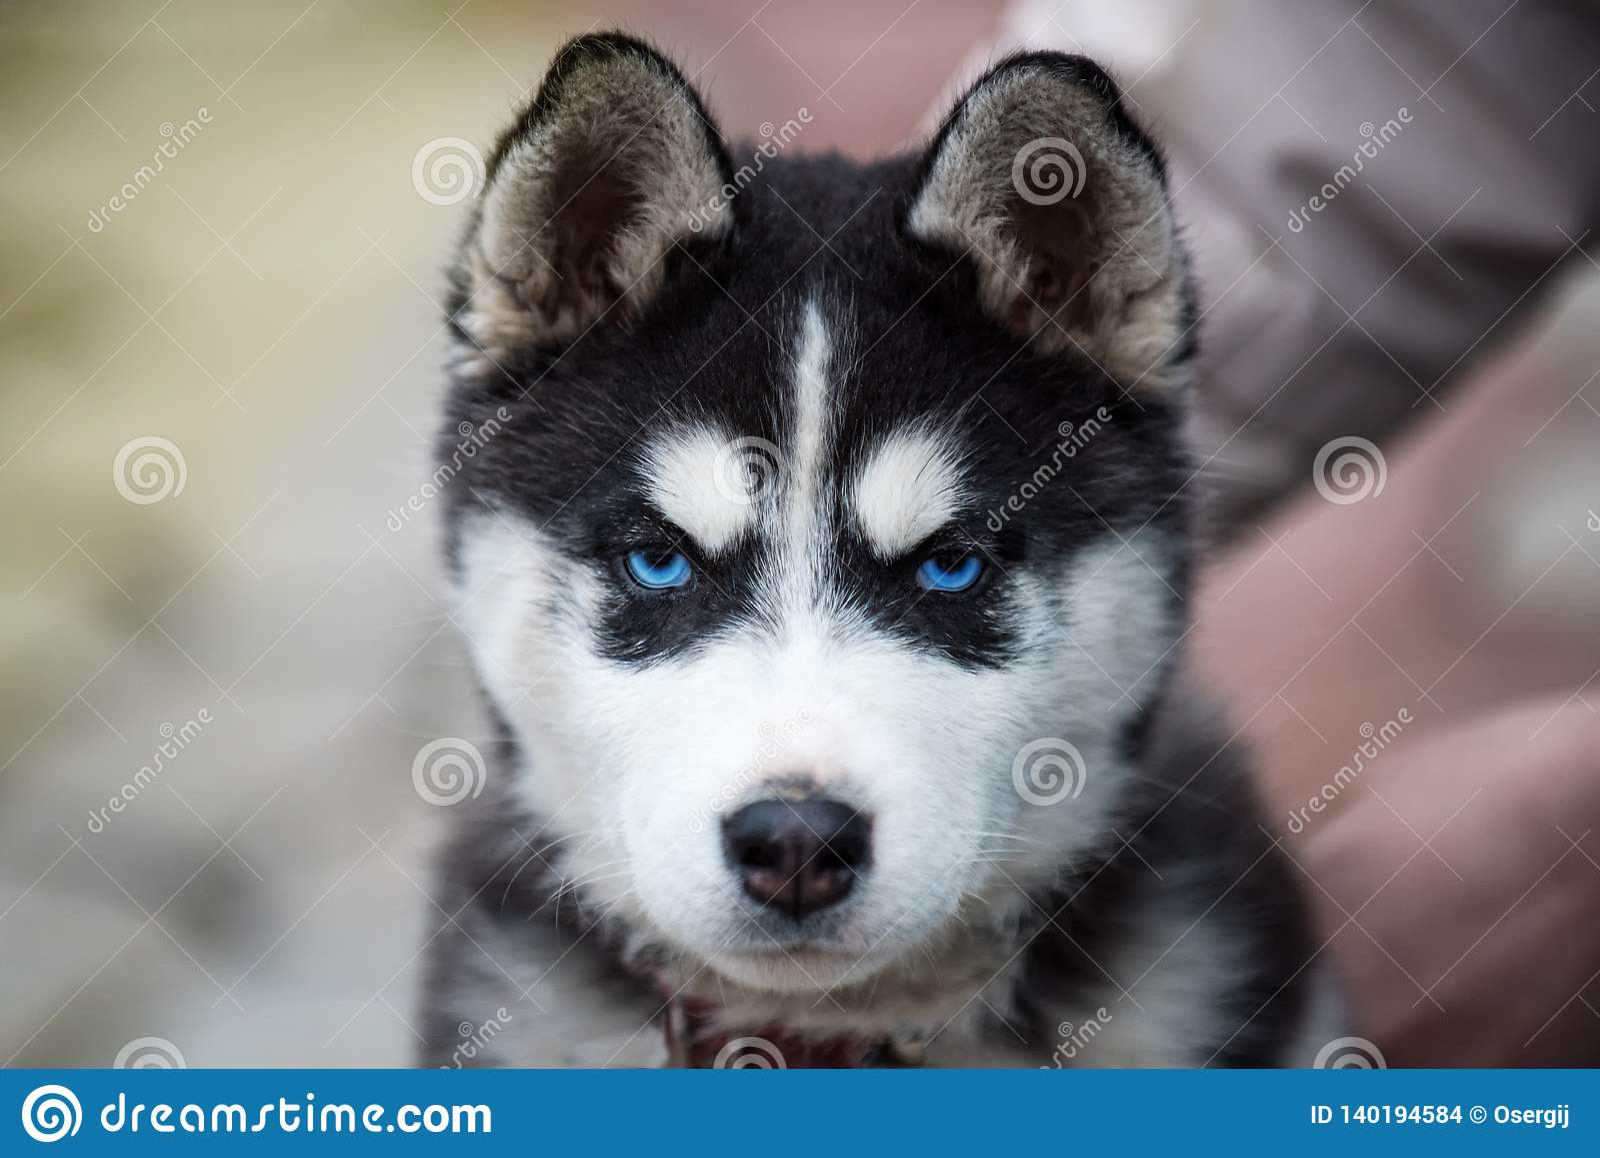 Blue Eyed Siberian Husky Puppy Head 8 Weeks Old Female Headshot With Purple Leash And Sandy Beach Background Stock Photo Image Of Facialmask Companion 140194584